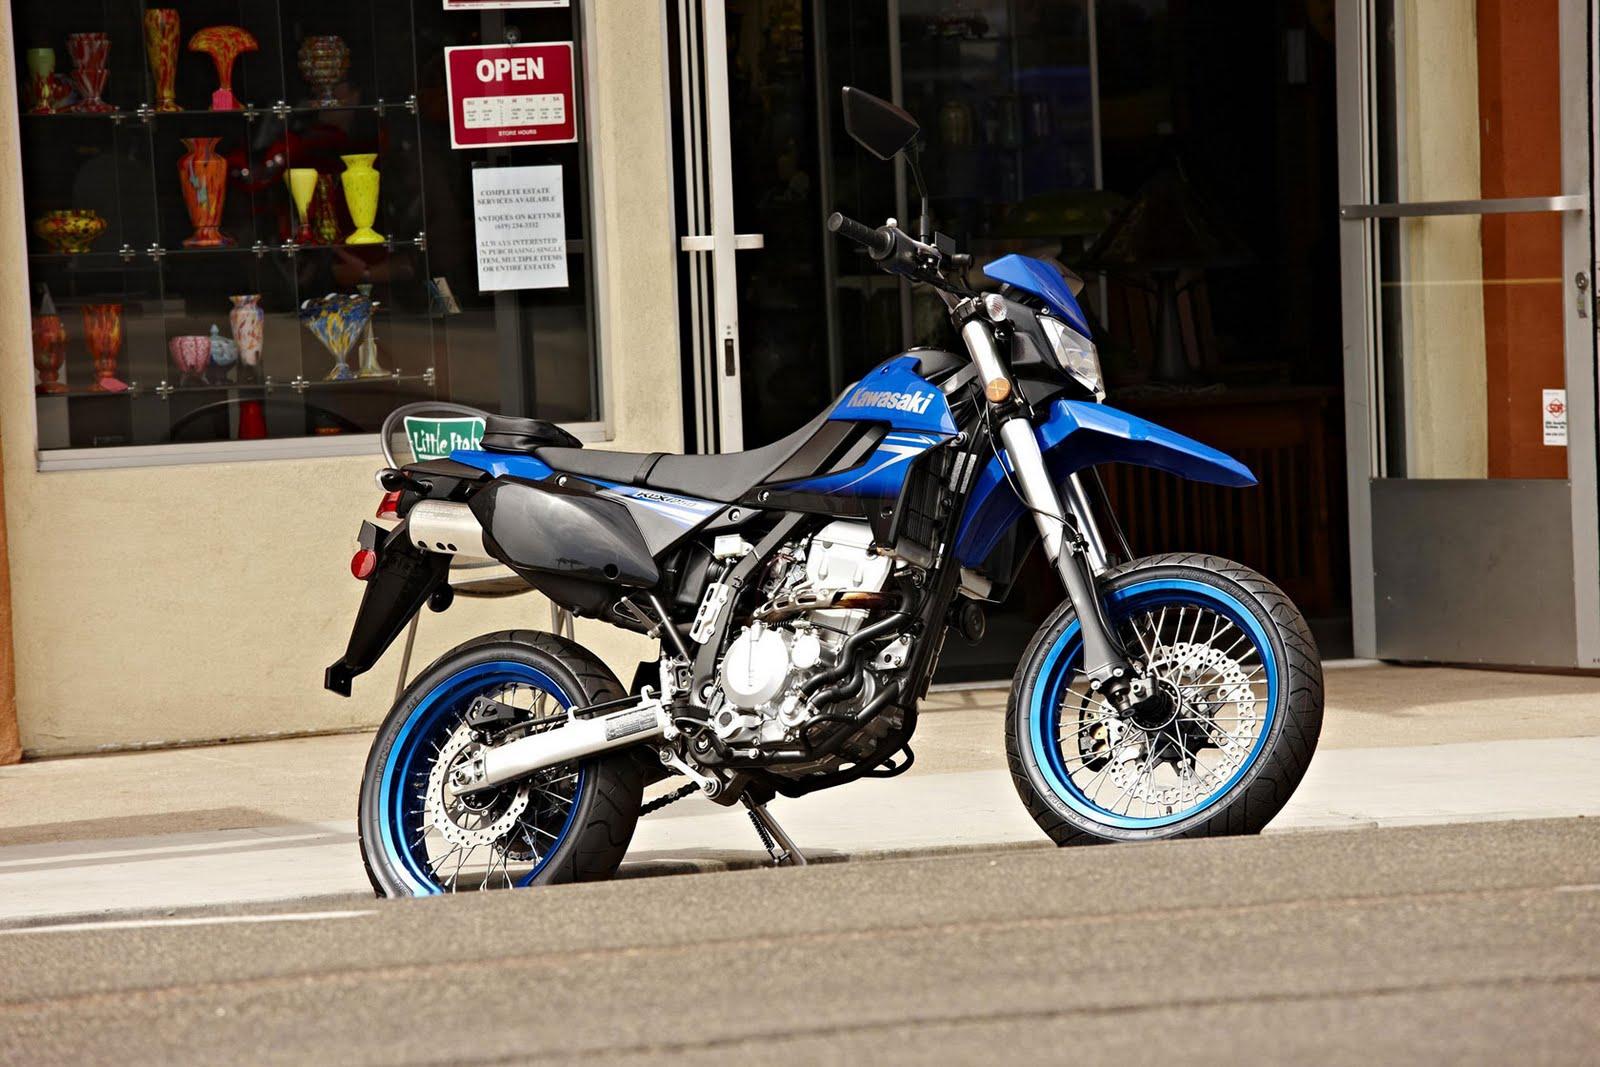 Kawasaki Supermoto Wallpaper Olivero Klr 250 Wiring Diagram Free Download Klx Sf 2010 Blue Motorcycle